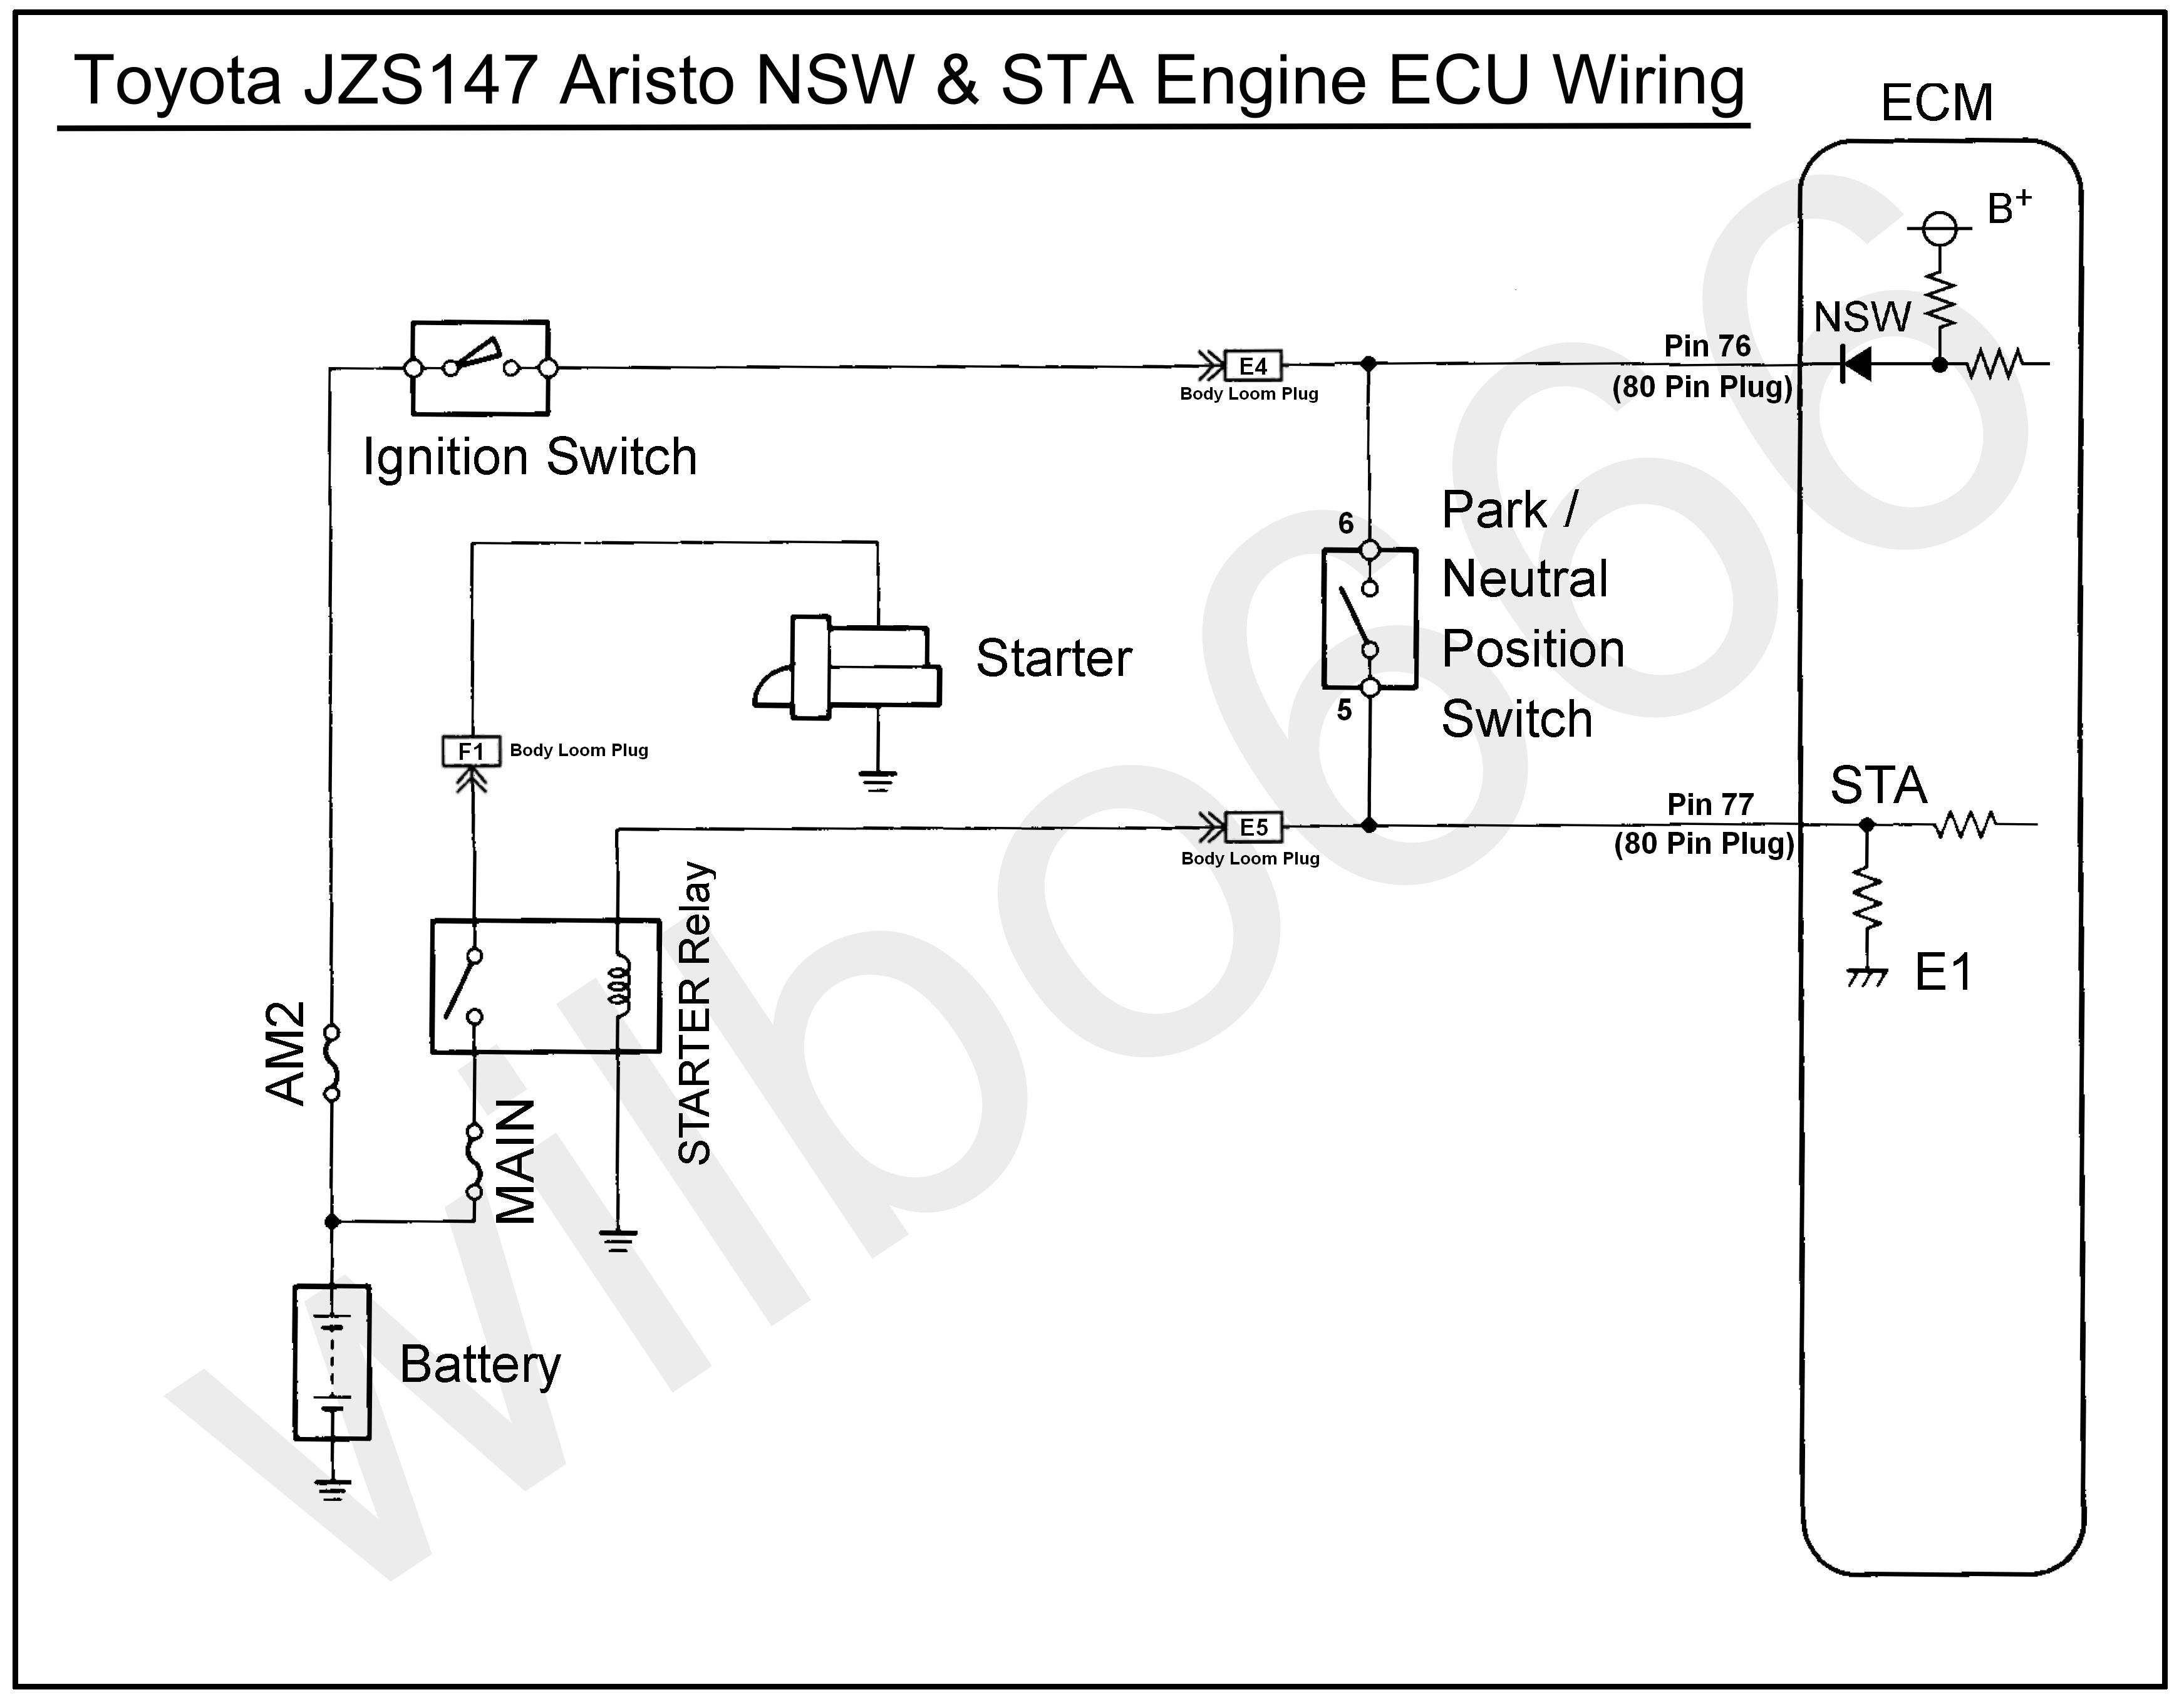 Toyota Igniter Wiring Diagram | Wiring Library - Toyota Igniter Wiring Diagram